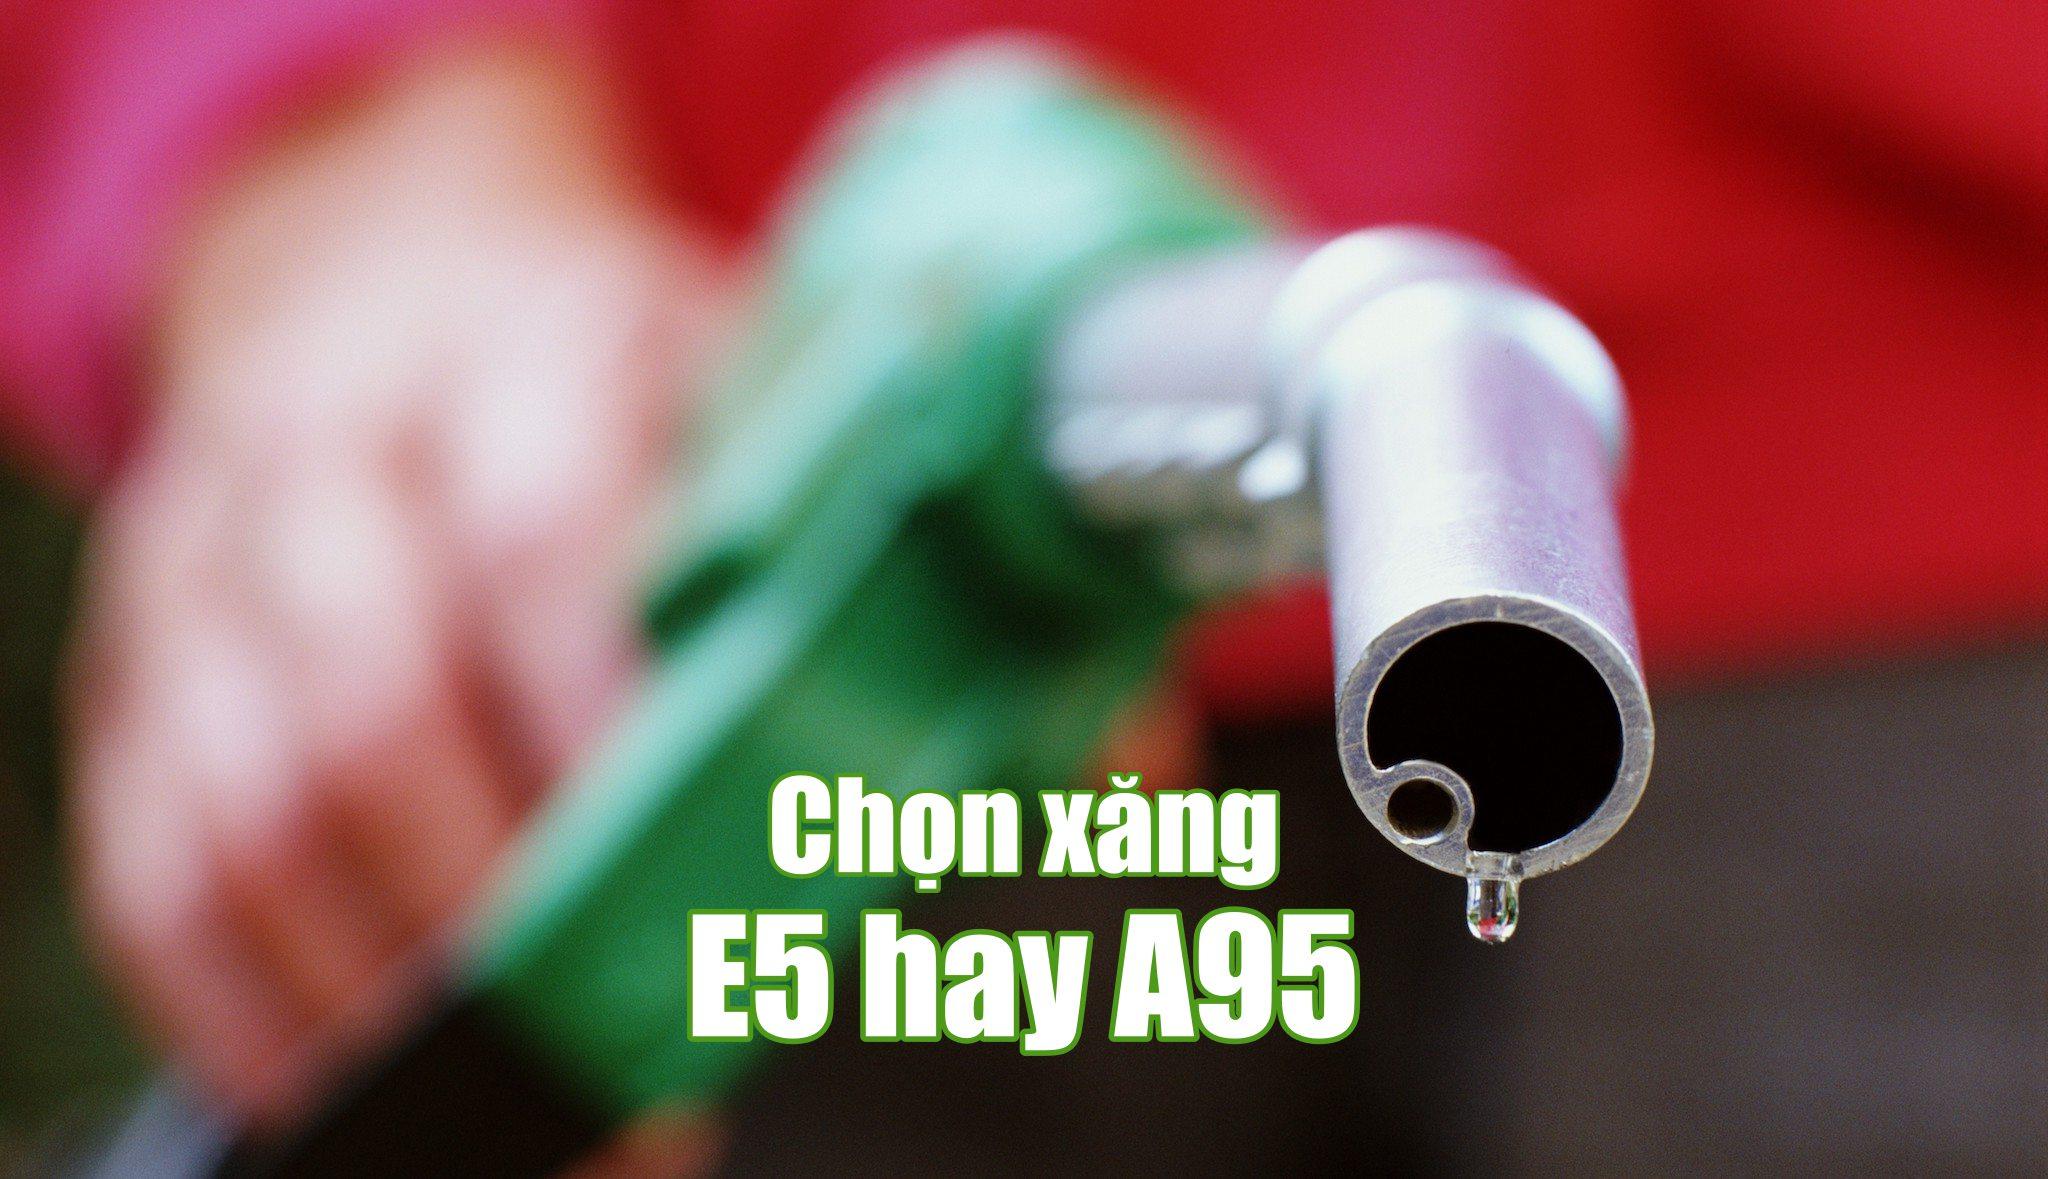 xang-95-hay-e5-hay-de-thi-truong-tu-dao-thai-thay-vi-ep-buoc